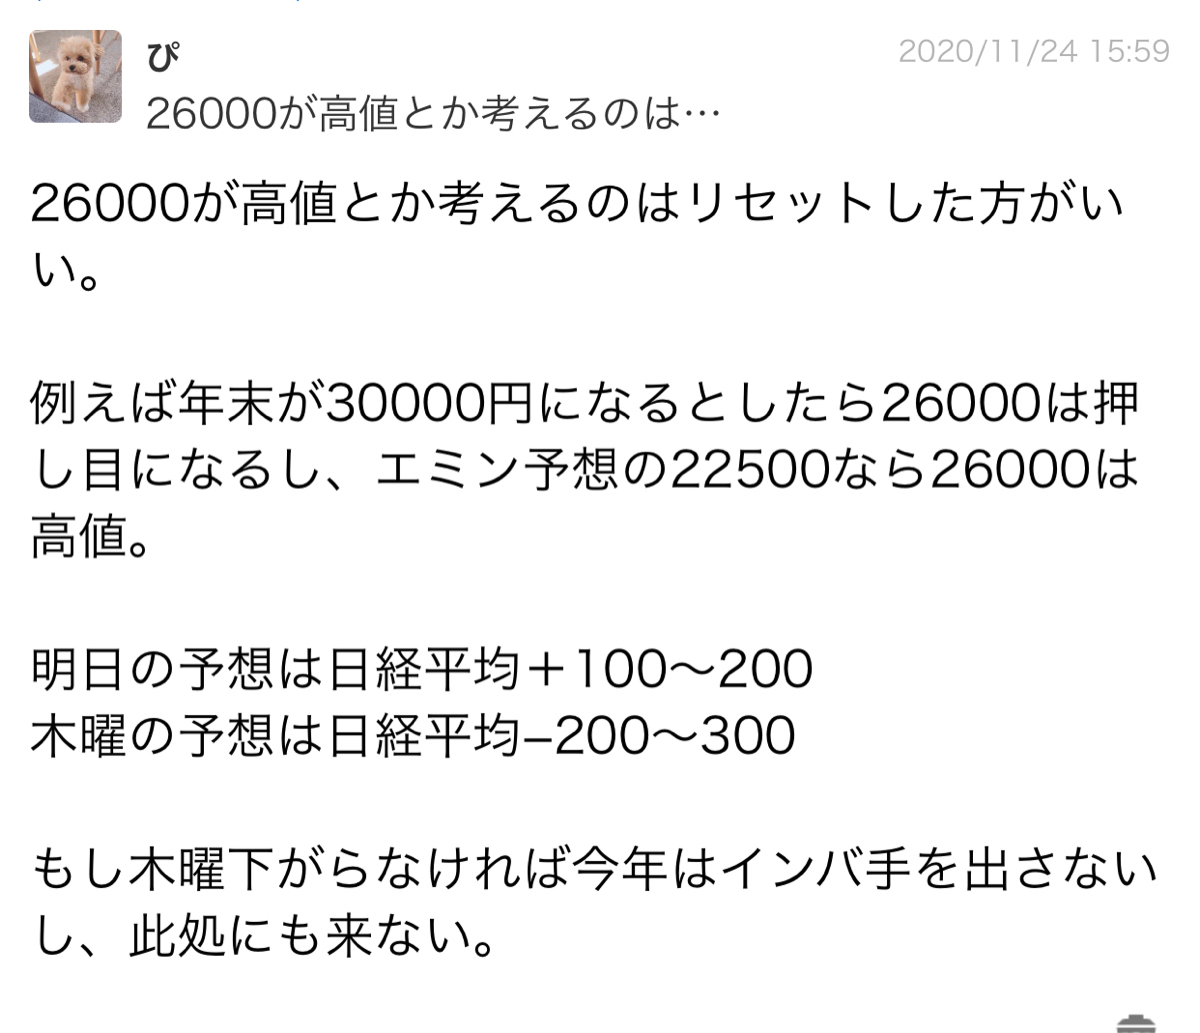 1357 - (NEXT FUNDS) 日経ダブルインバース上場投信 当たって下さいm(._.)m  インバ引退したくないんです。